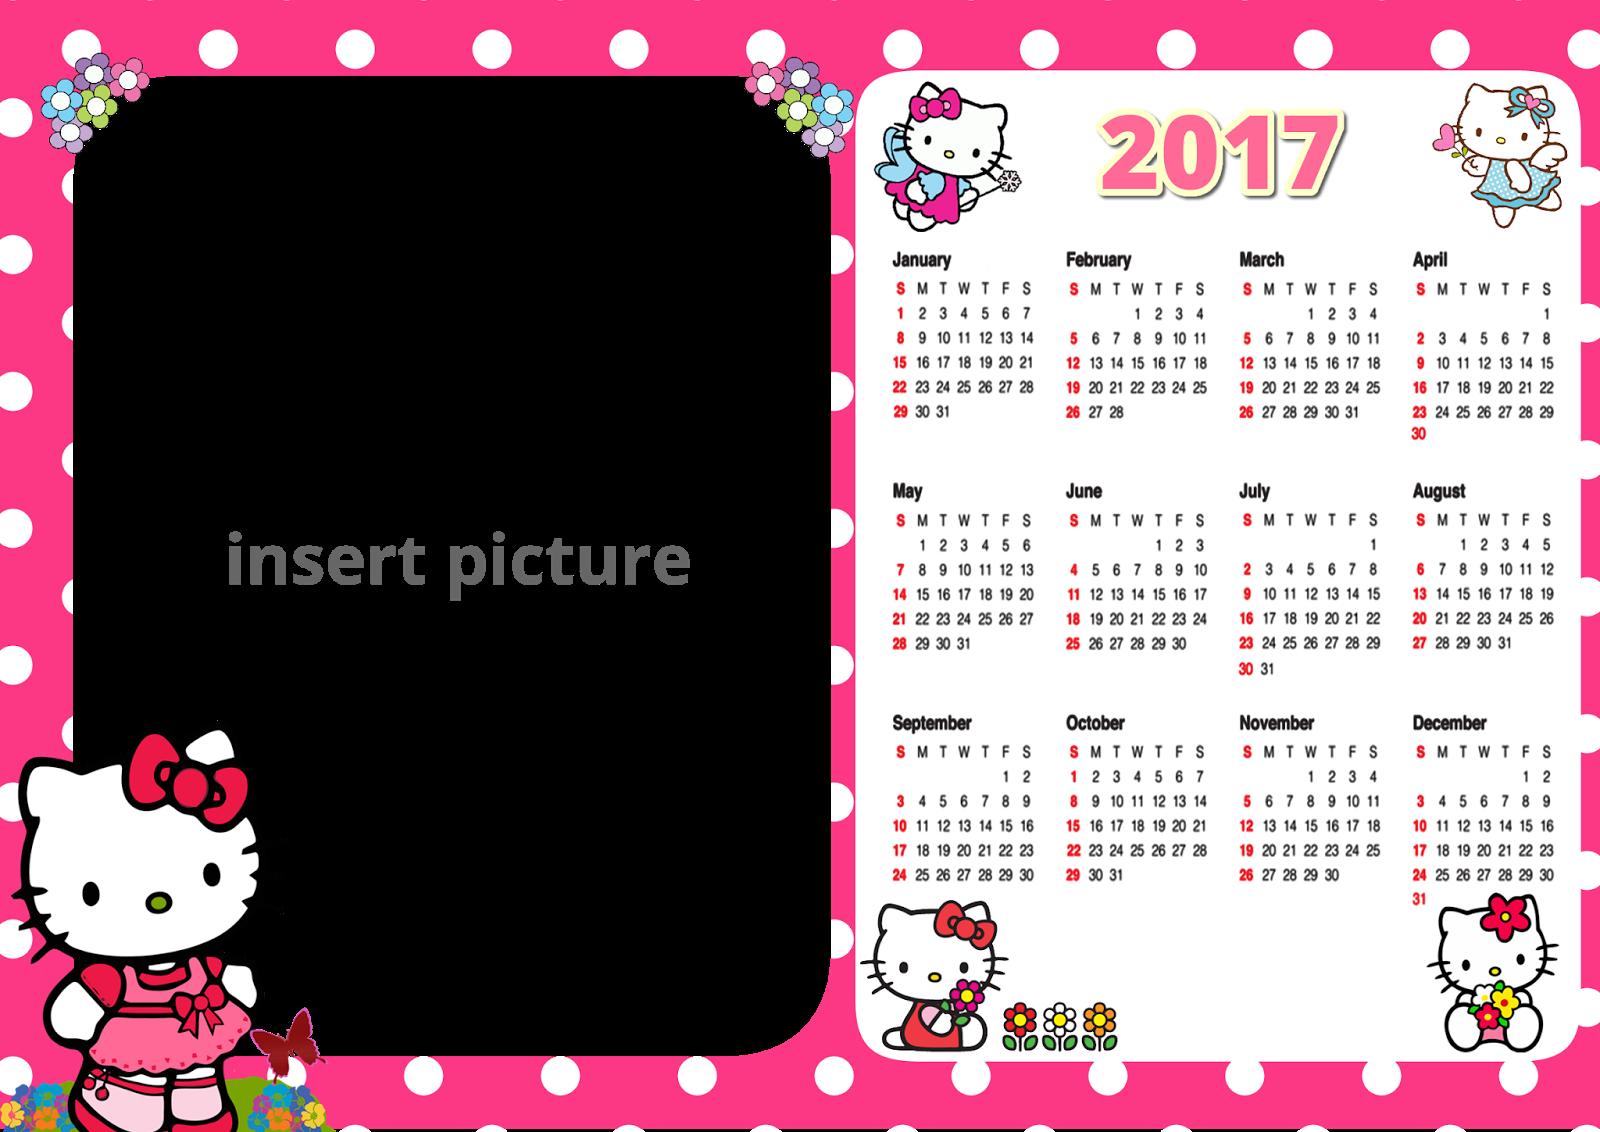 Großartig Hello Kitty Picture Frame Target Bilder ...